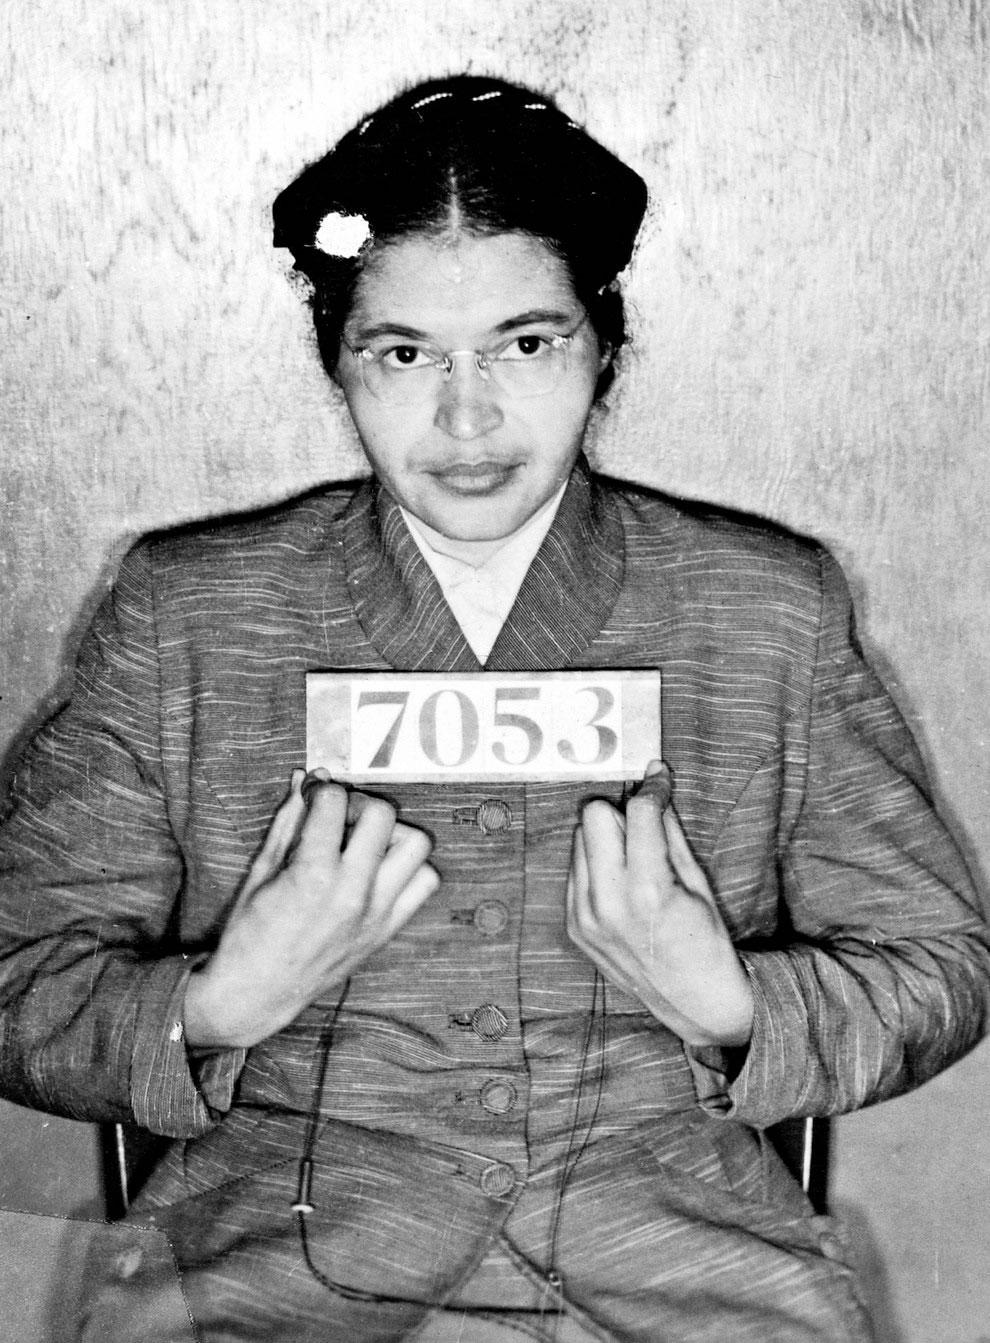 poza-de-inchisoare-Rosa-Parks-1955